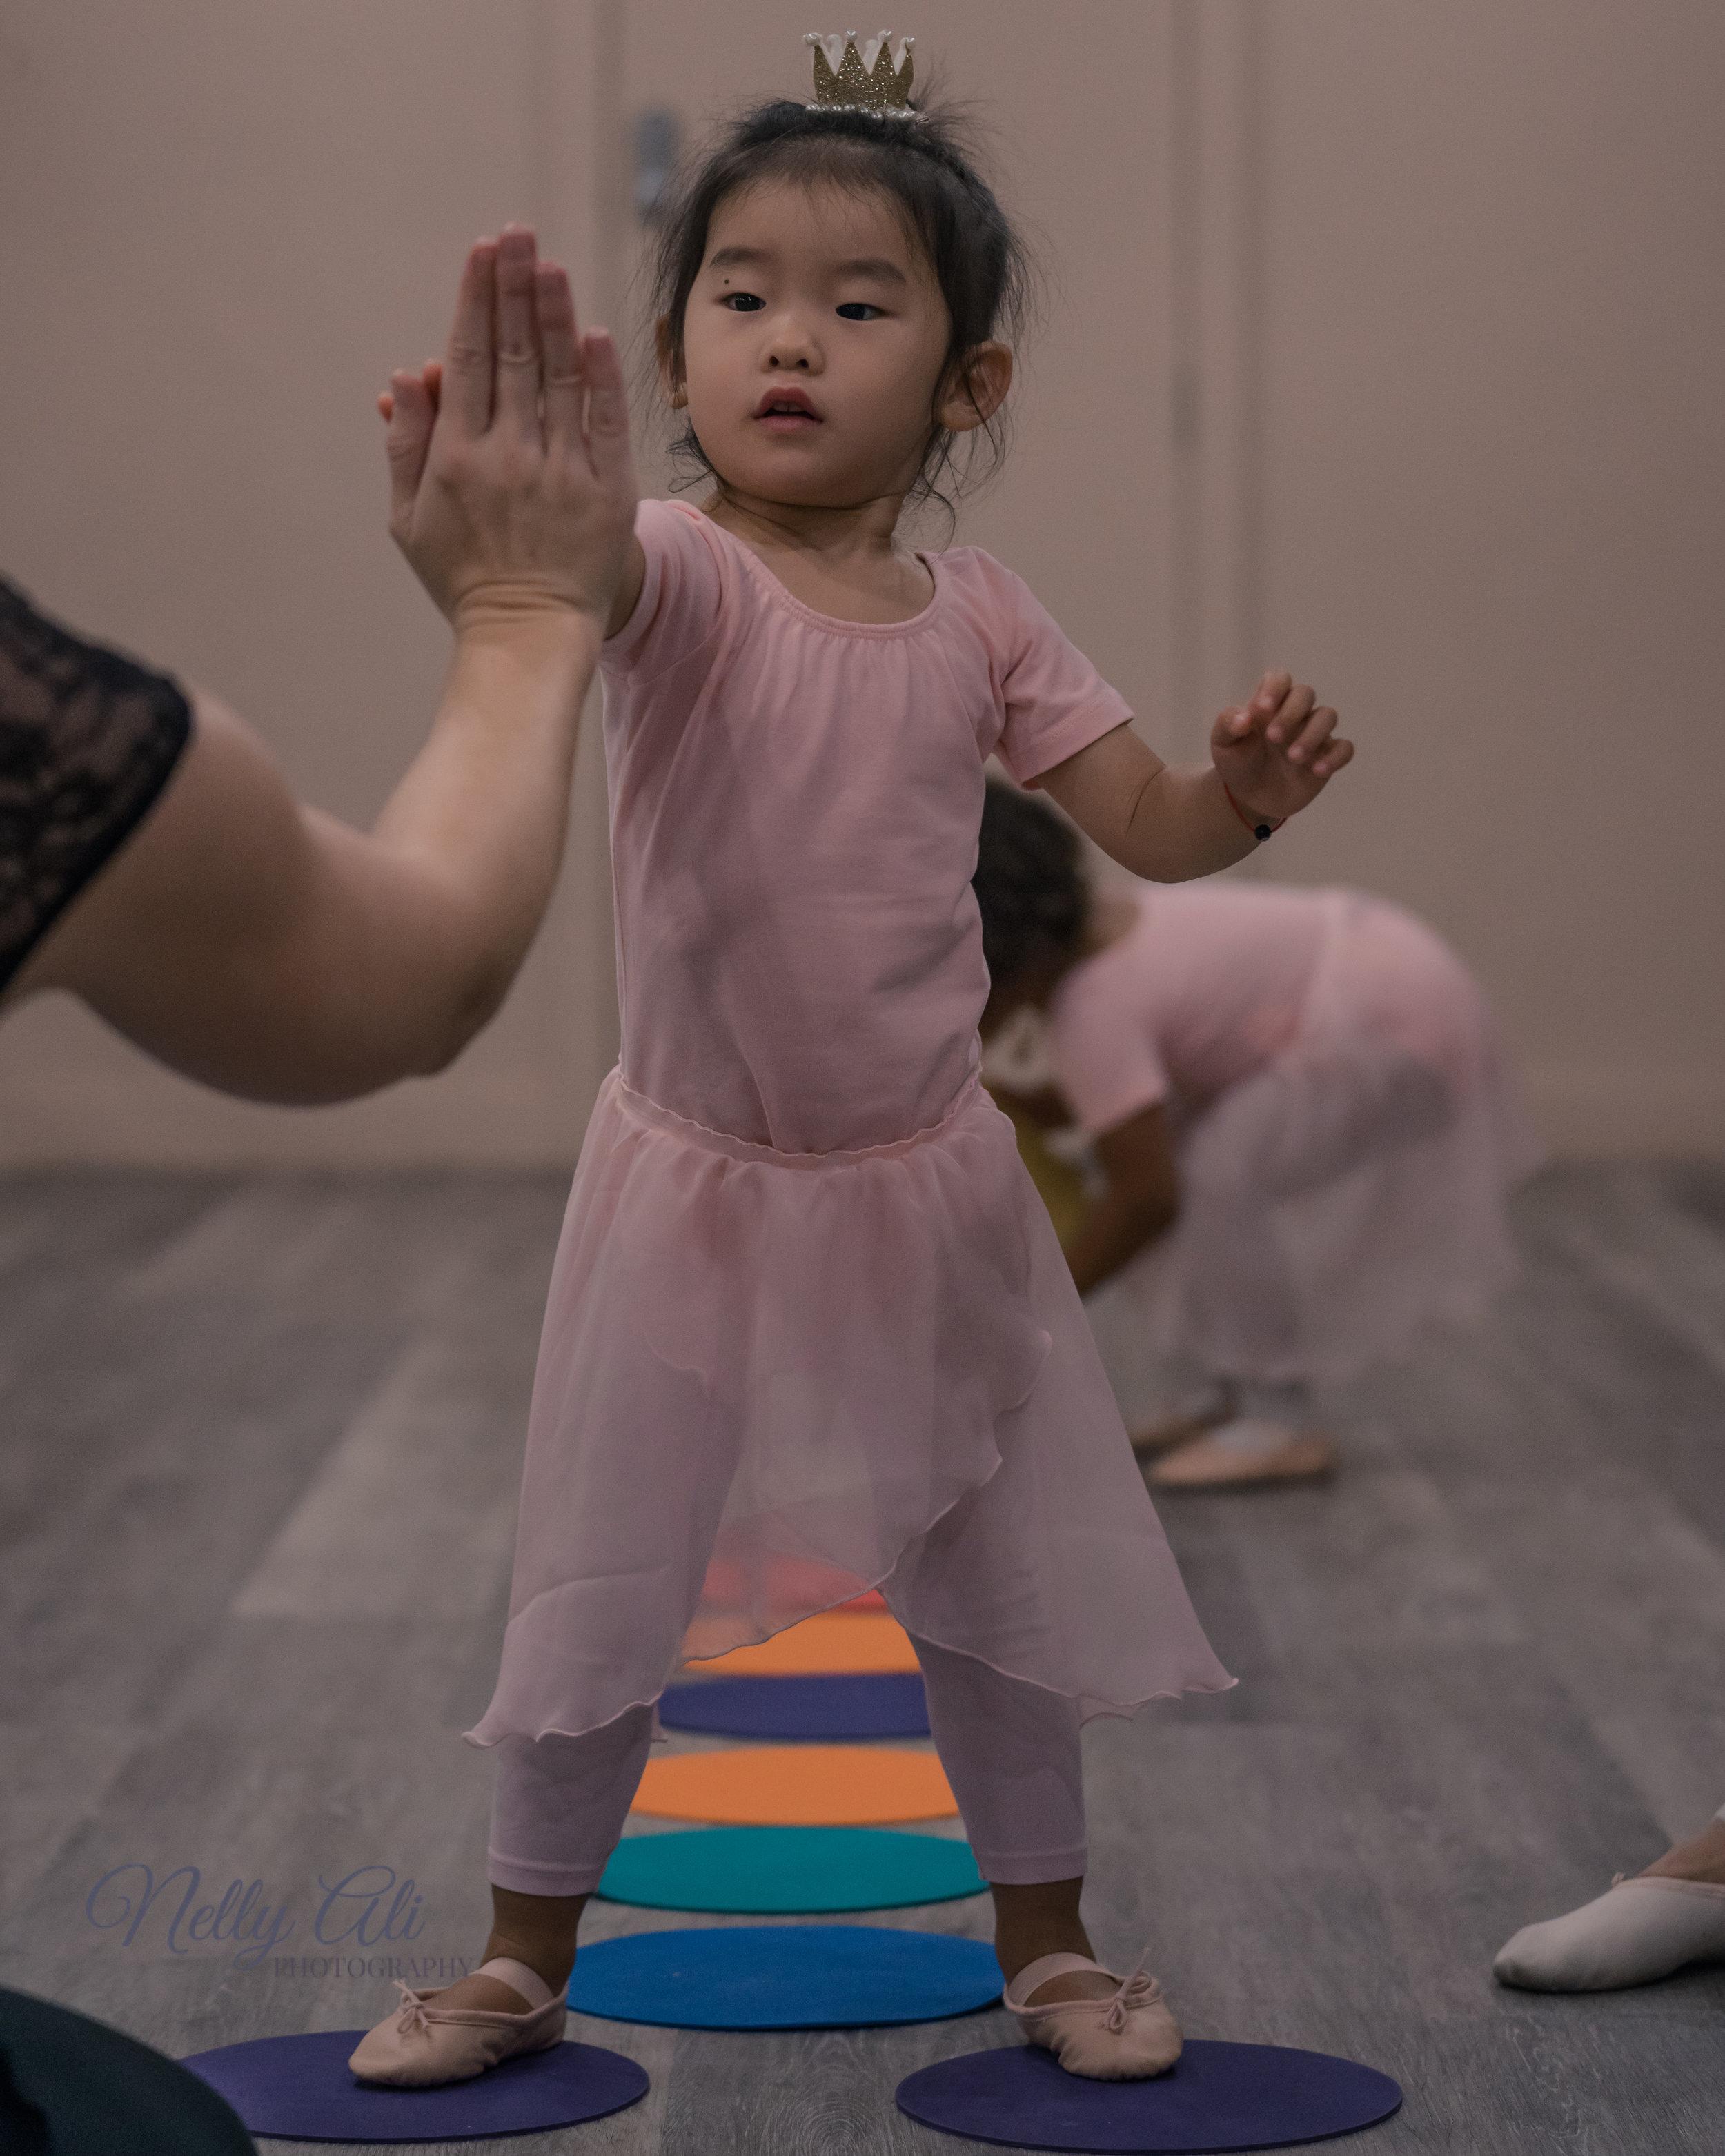 Baby Ballet Hammersmith-mv2_d_4530_5662_s_4_2.jpg